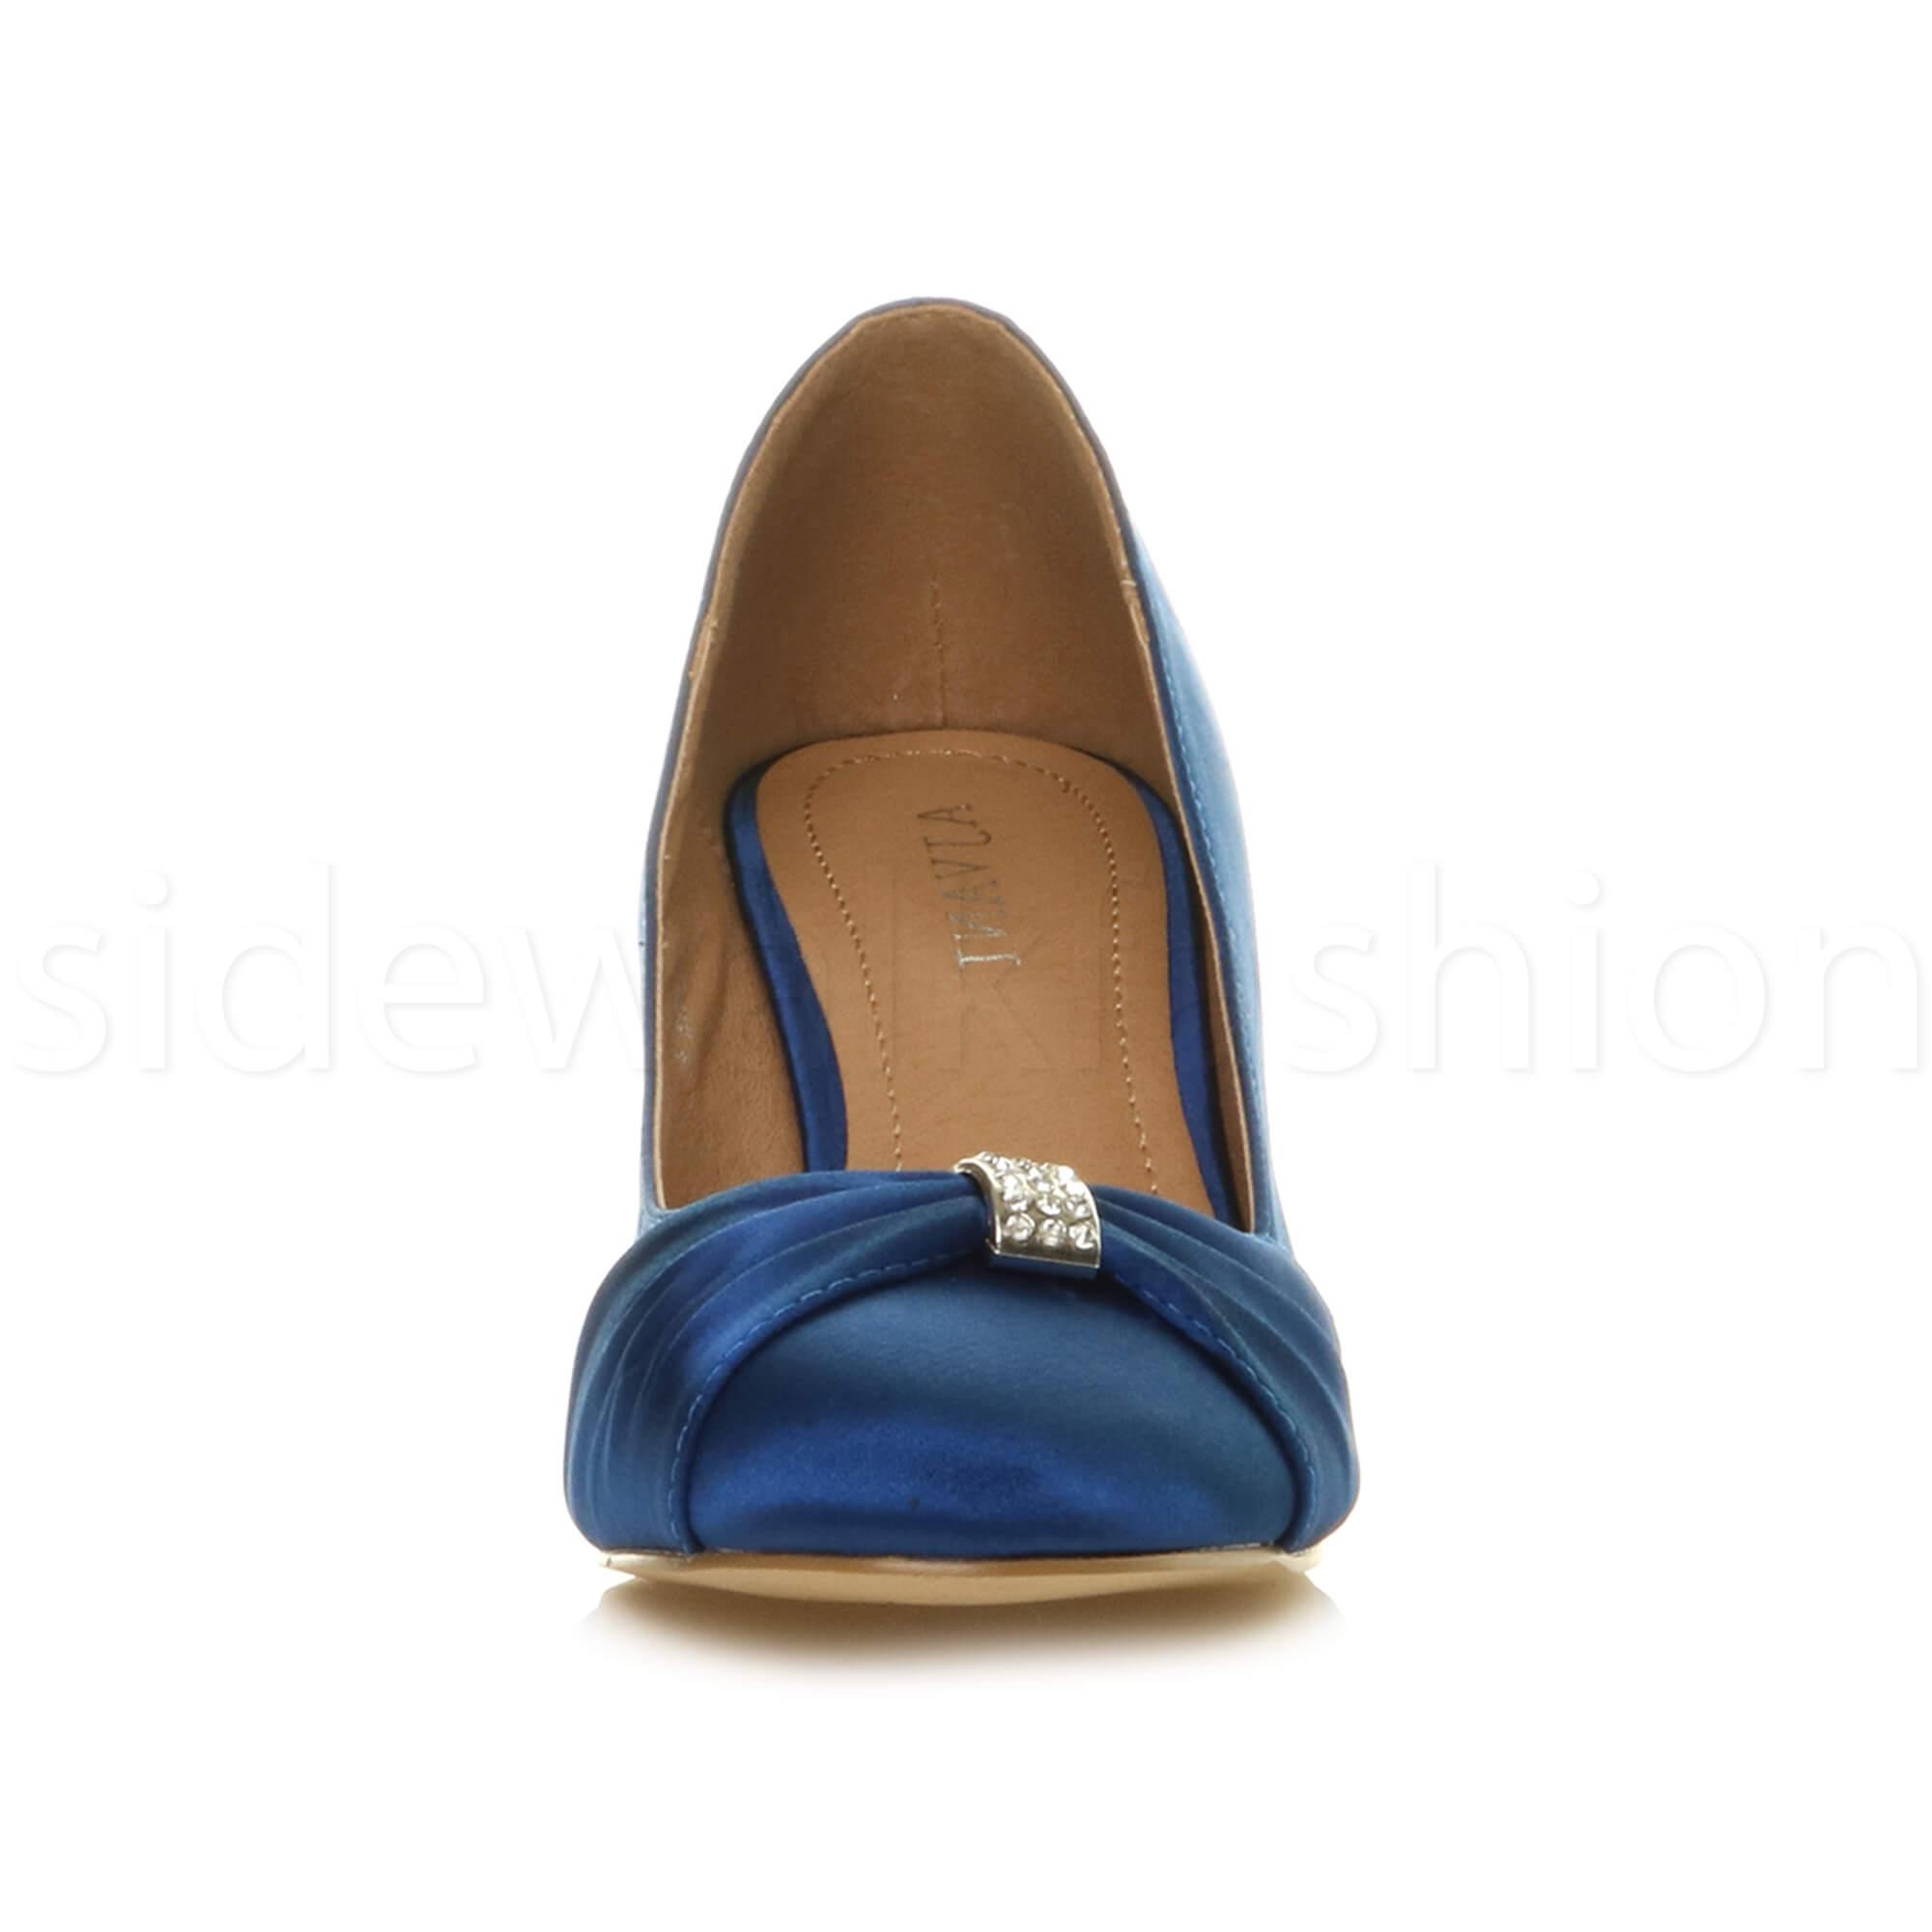 Womens-ladies-low-mid-heel-diamante-party-smart-evening-court-shoes-size thumbnail 55